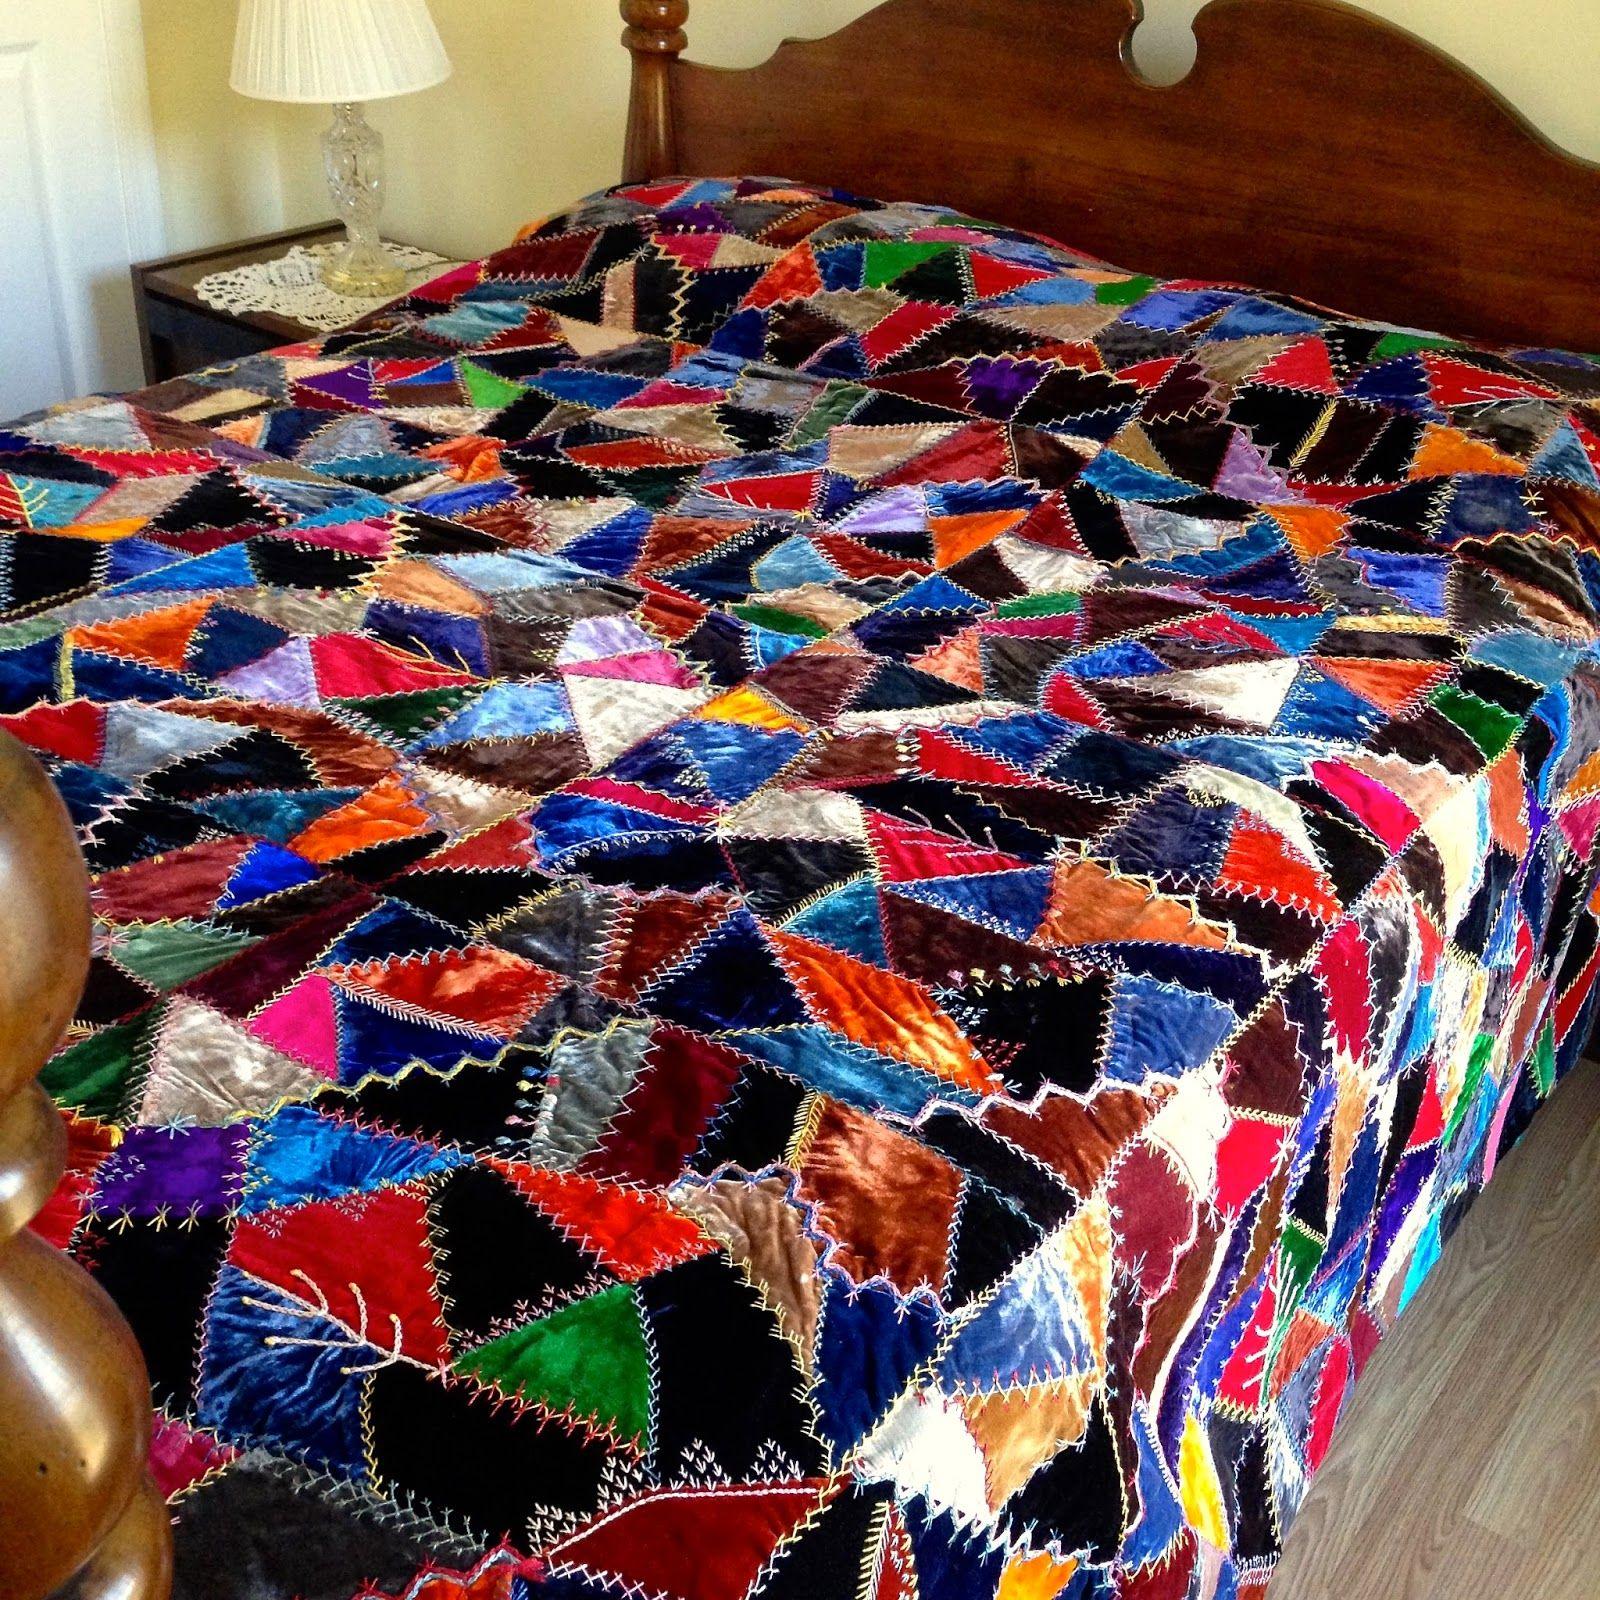 Crazy For Crazy Quilts Antique Crazy Quilts Quilts